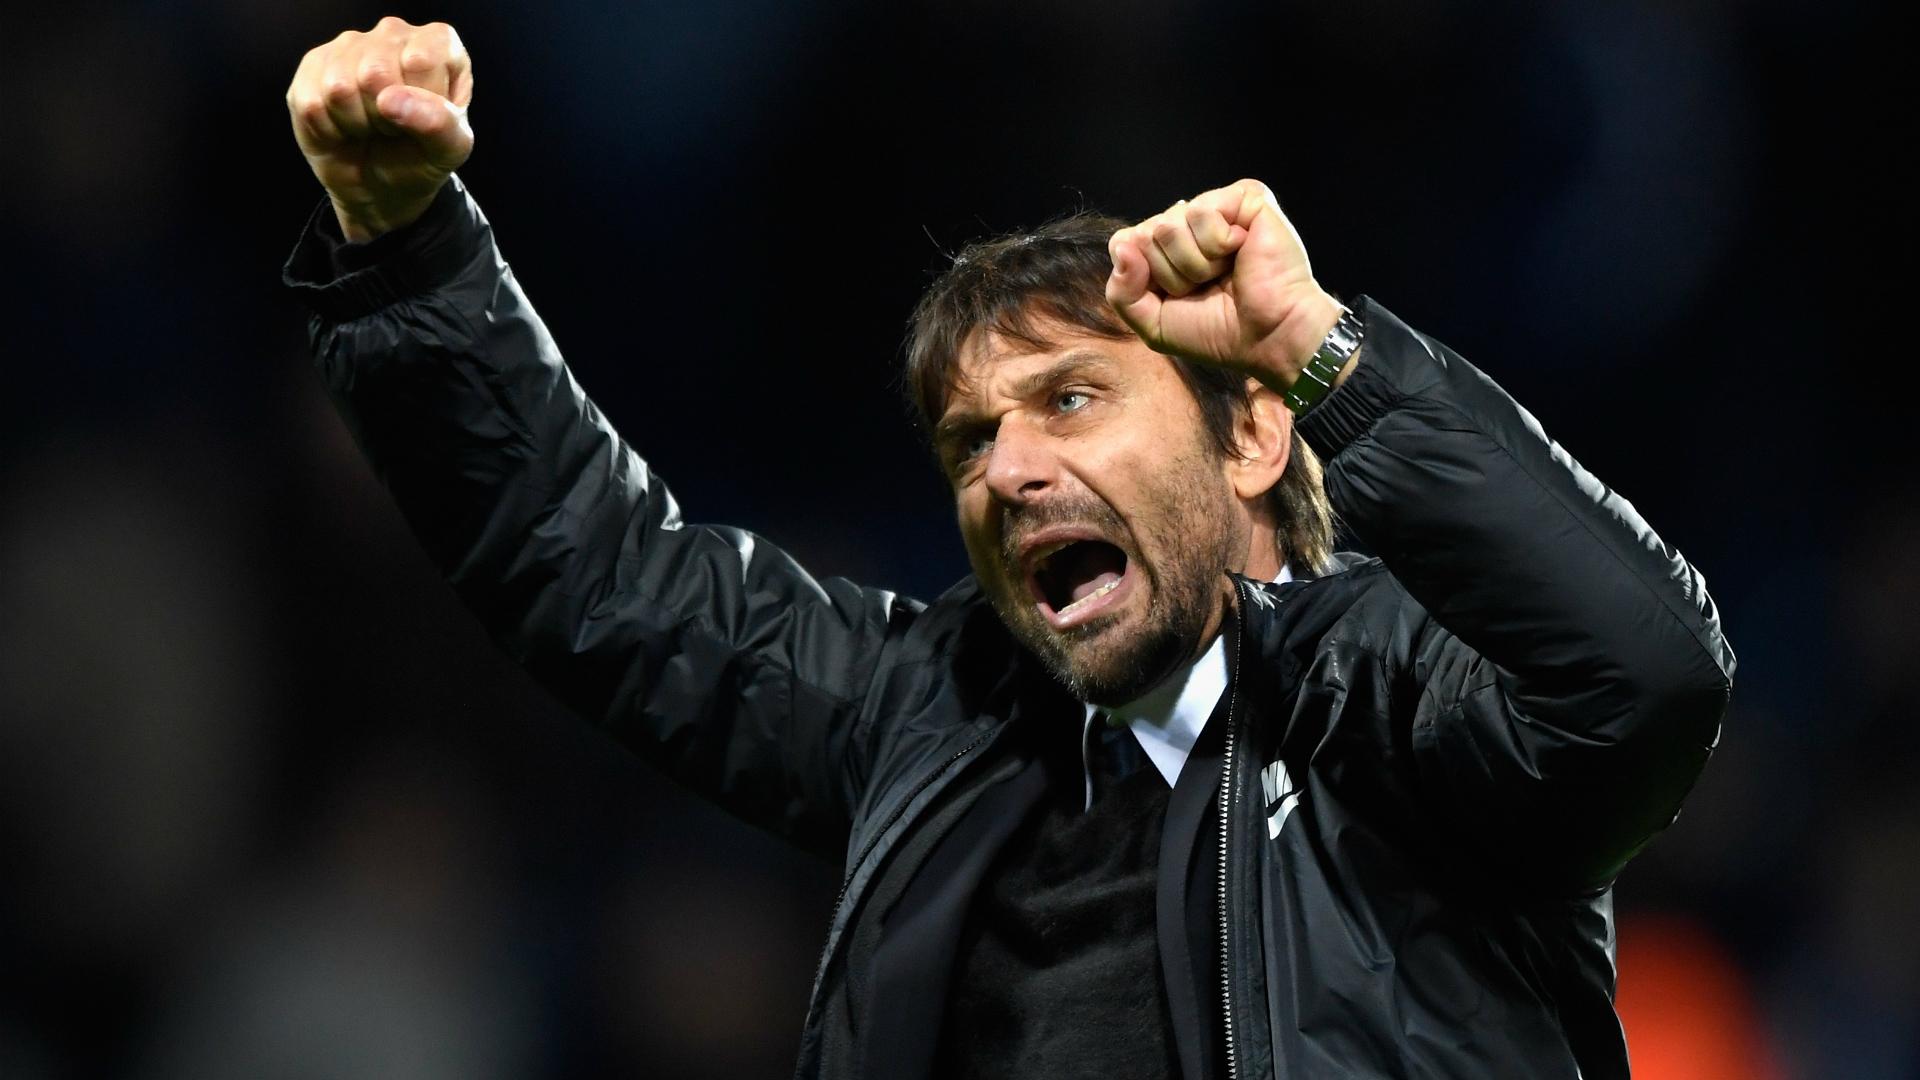 Cesc Fabregas hopes for Champions League success with Chelsea